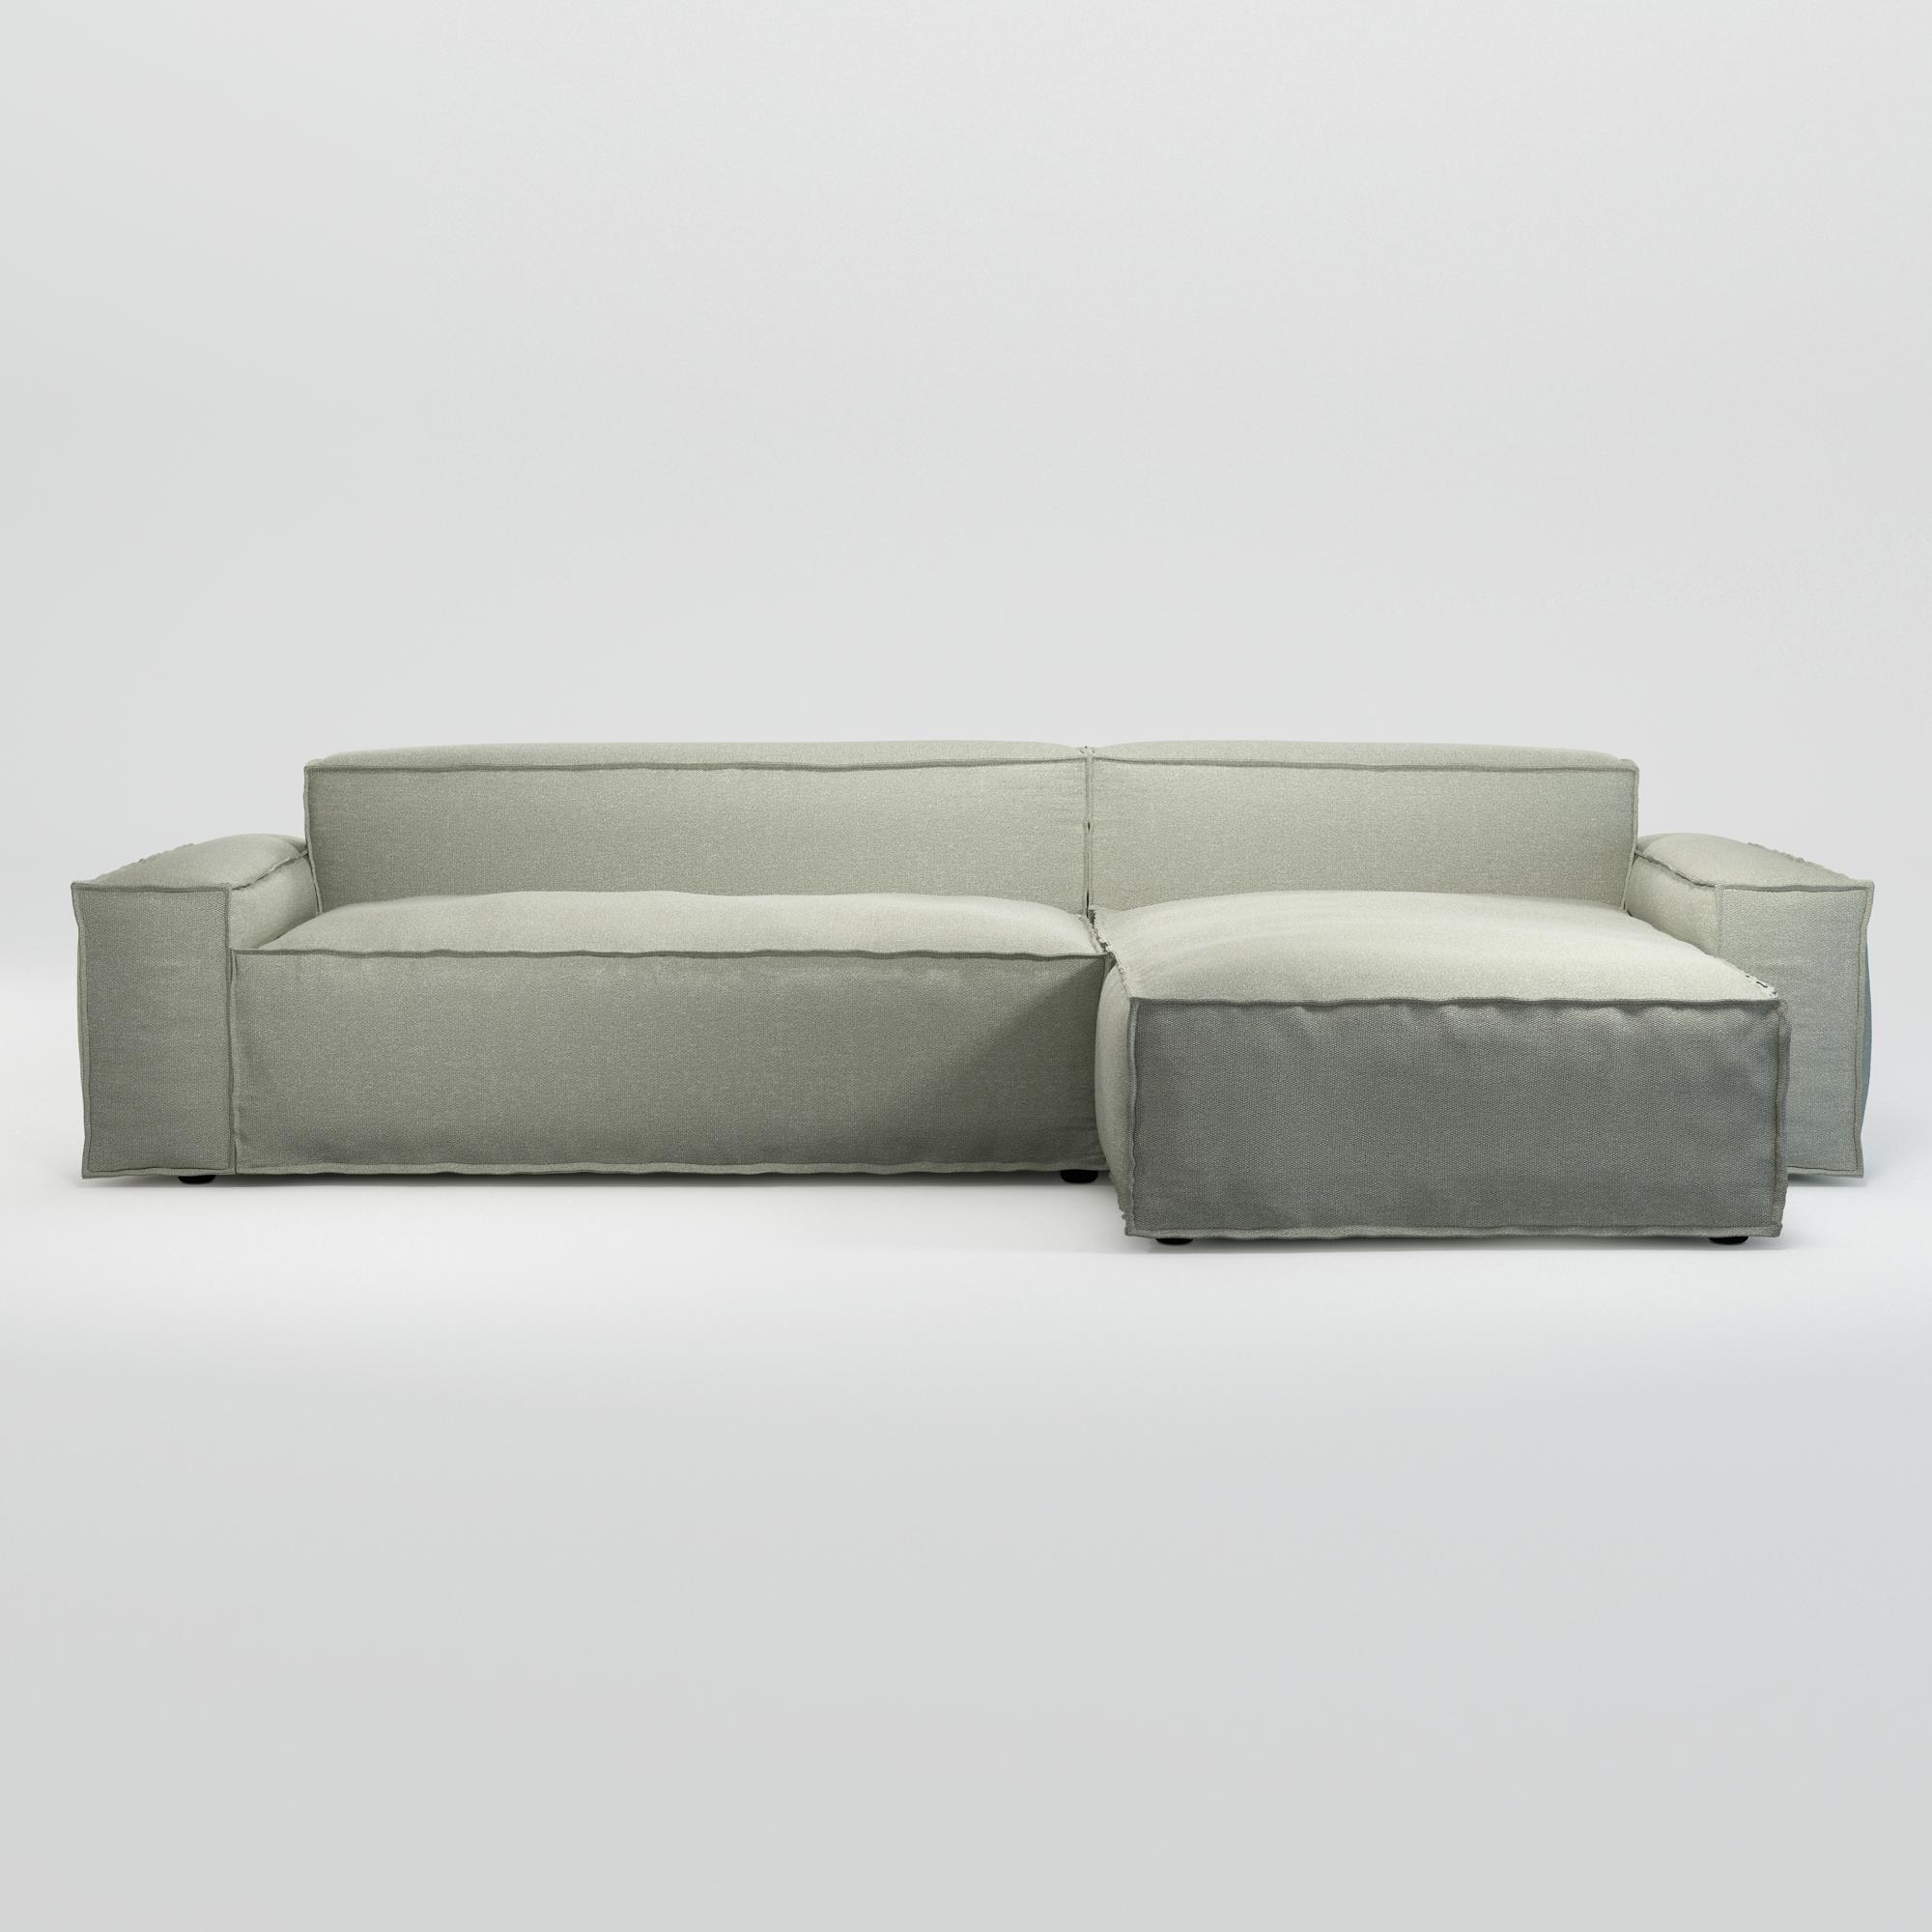 Planar Corner Sofa Right Facing In 2020 Corner Sofa Sofa Furniture